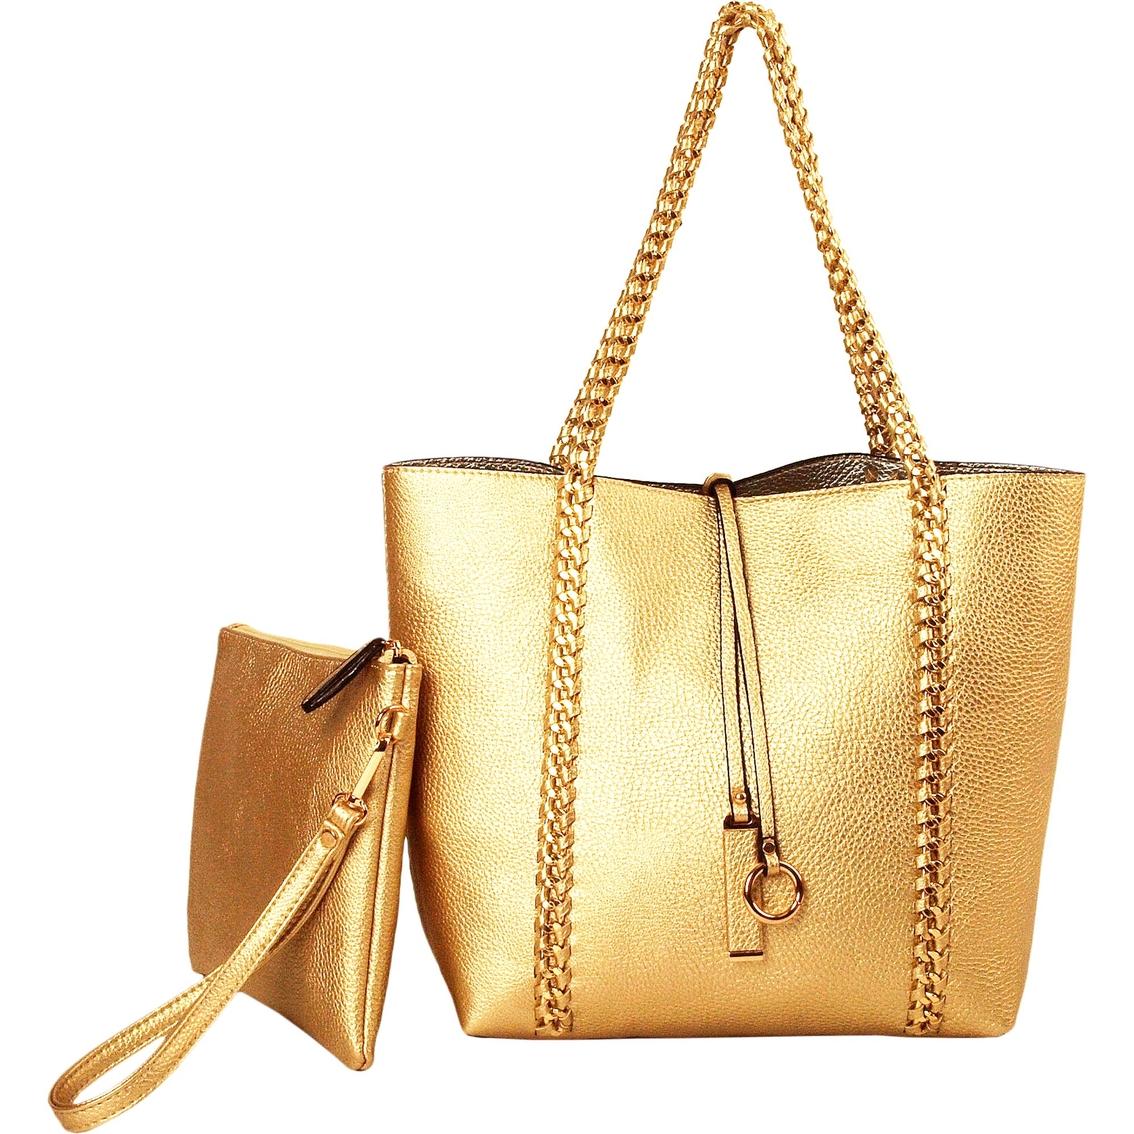 Imoshion Chain Reversible Tote   Totes   Shoppers   Handbags ... be079b5822